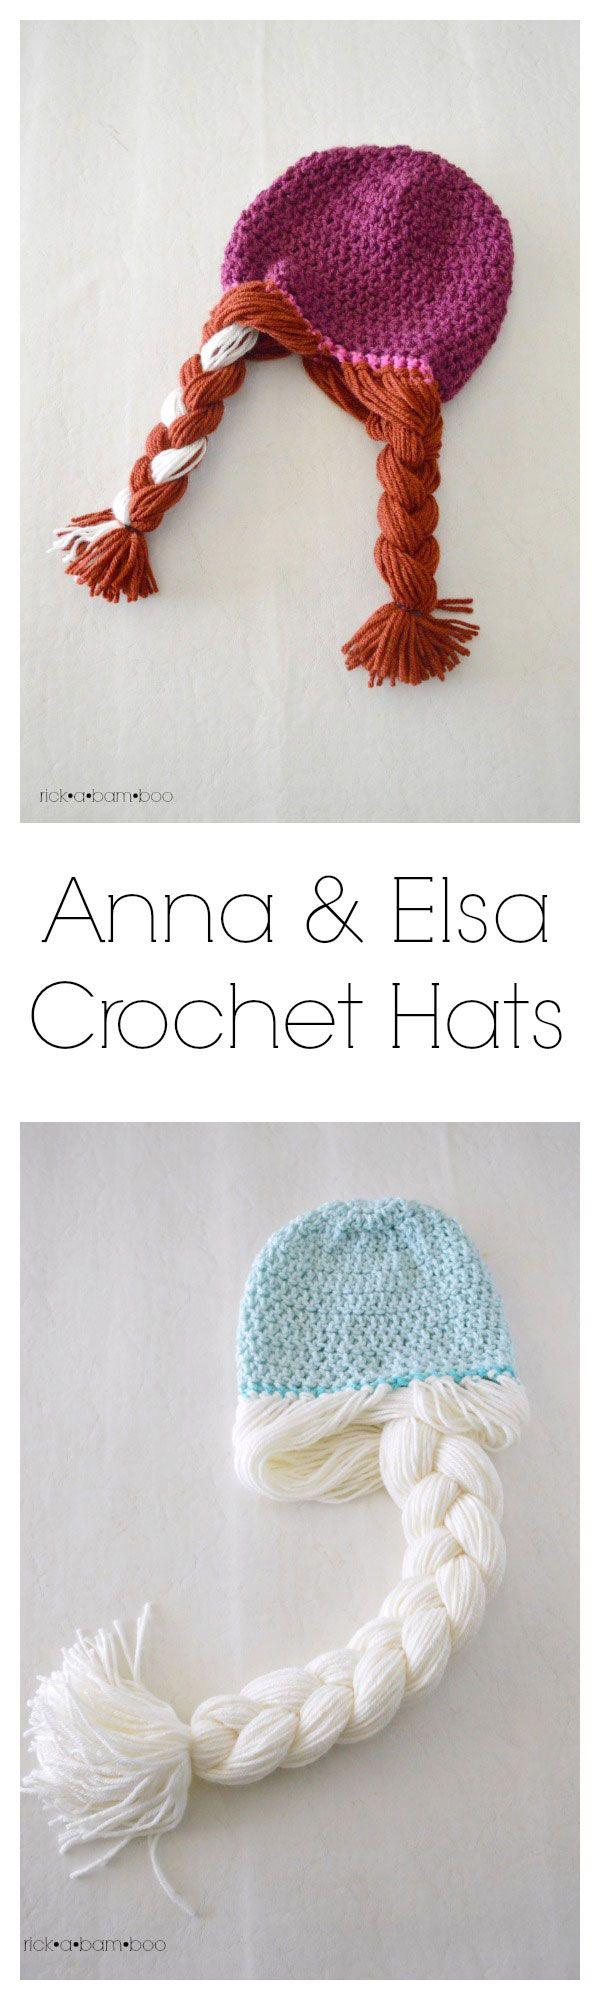 Anna & Elsa Crochet Hat | rickabamboo.com | #disney #frozen #pattern ...